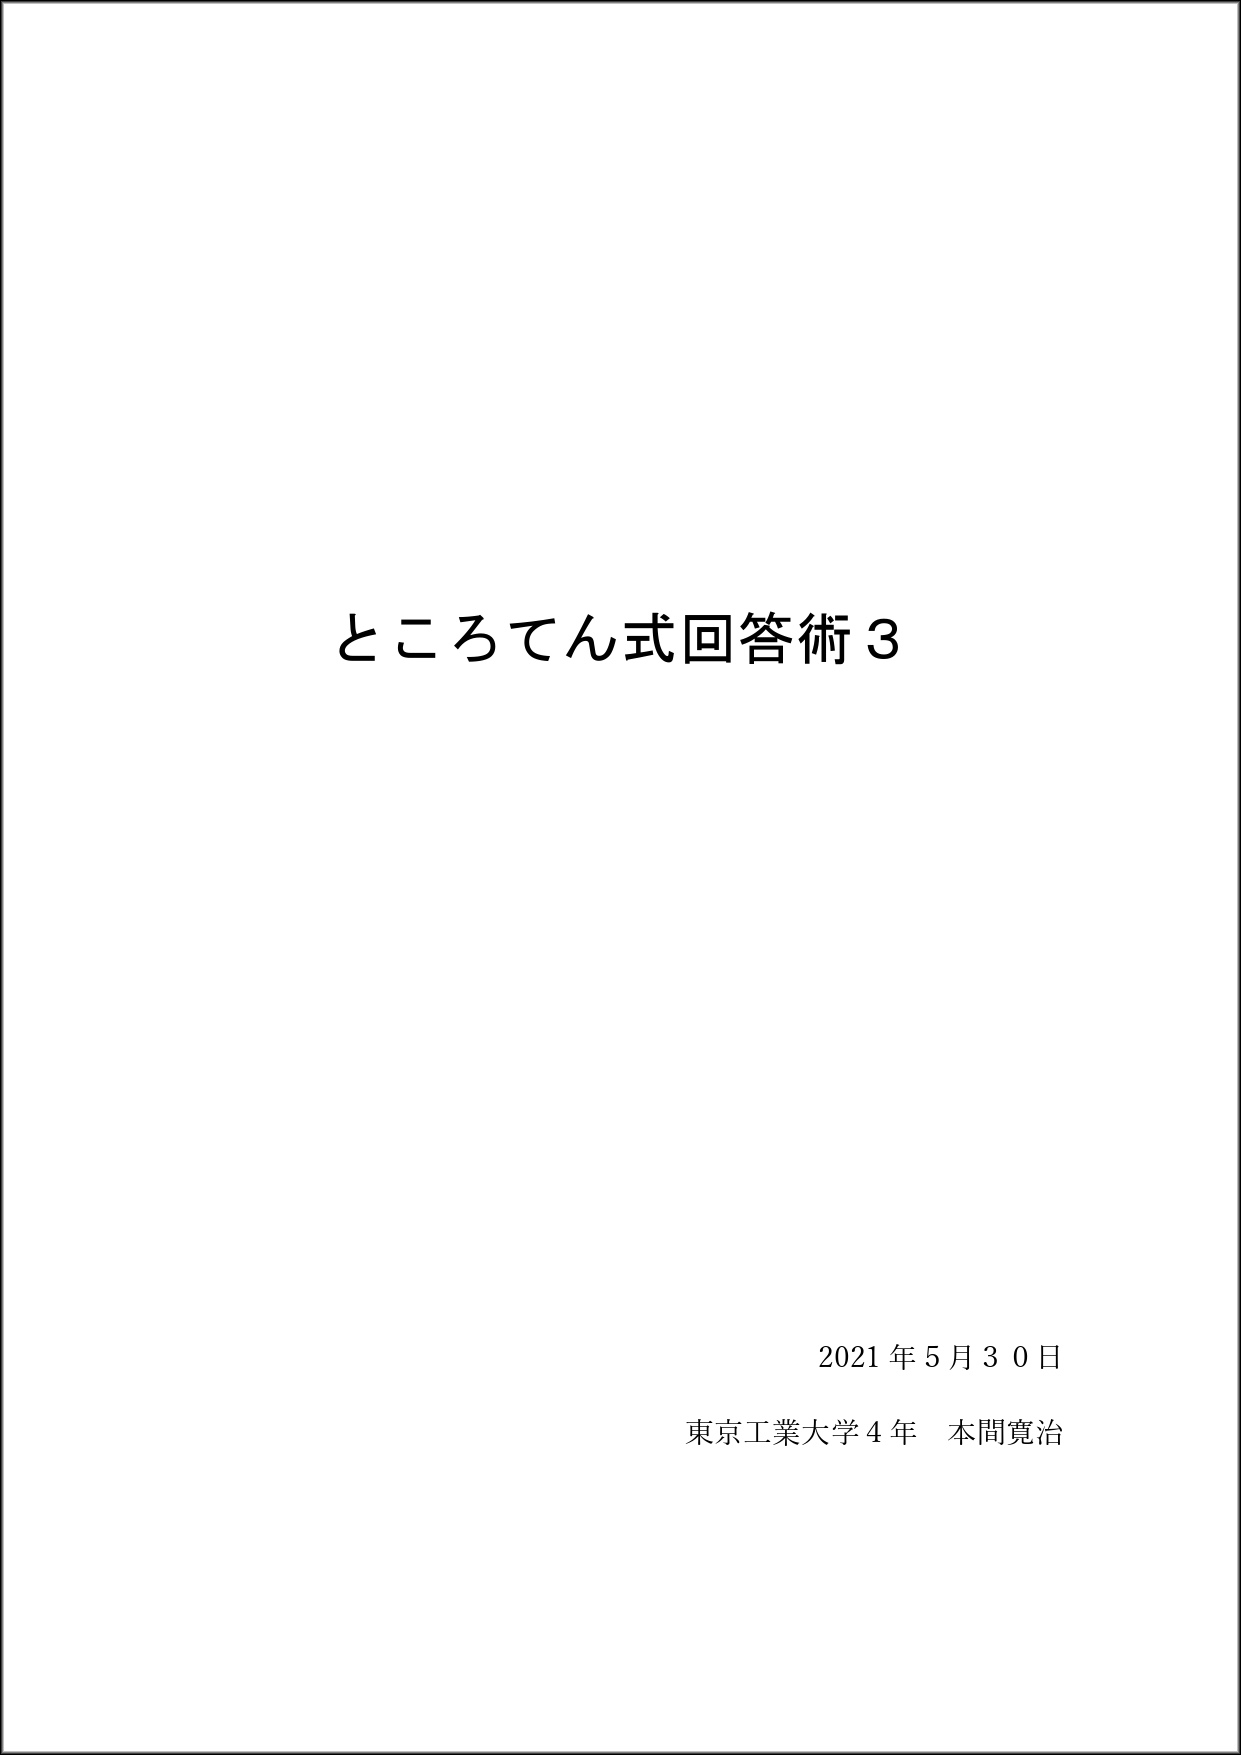 C33042041